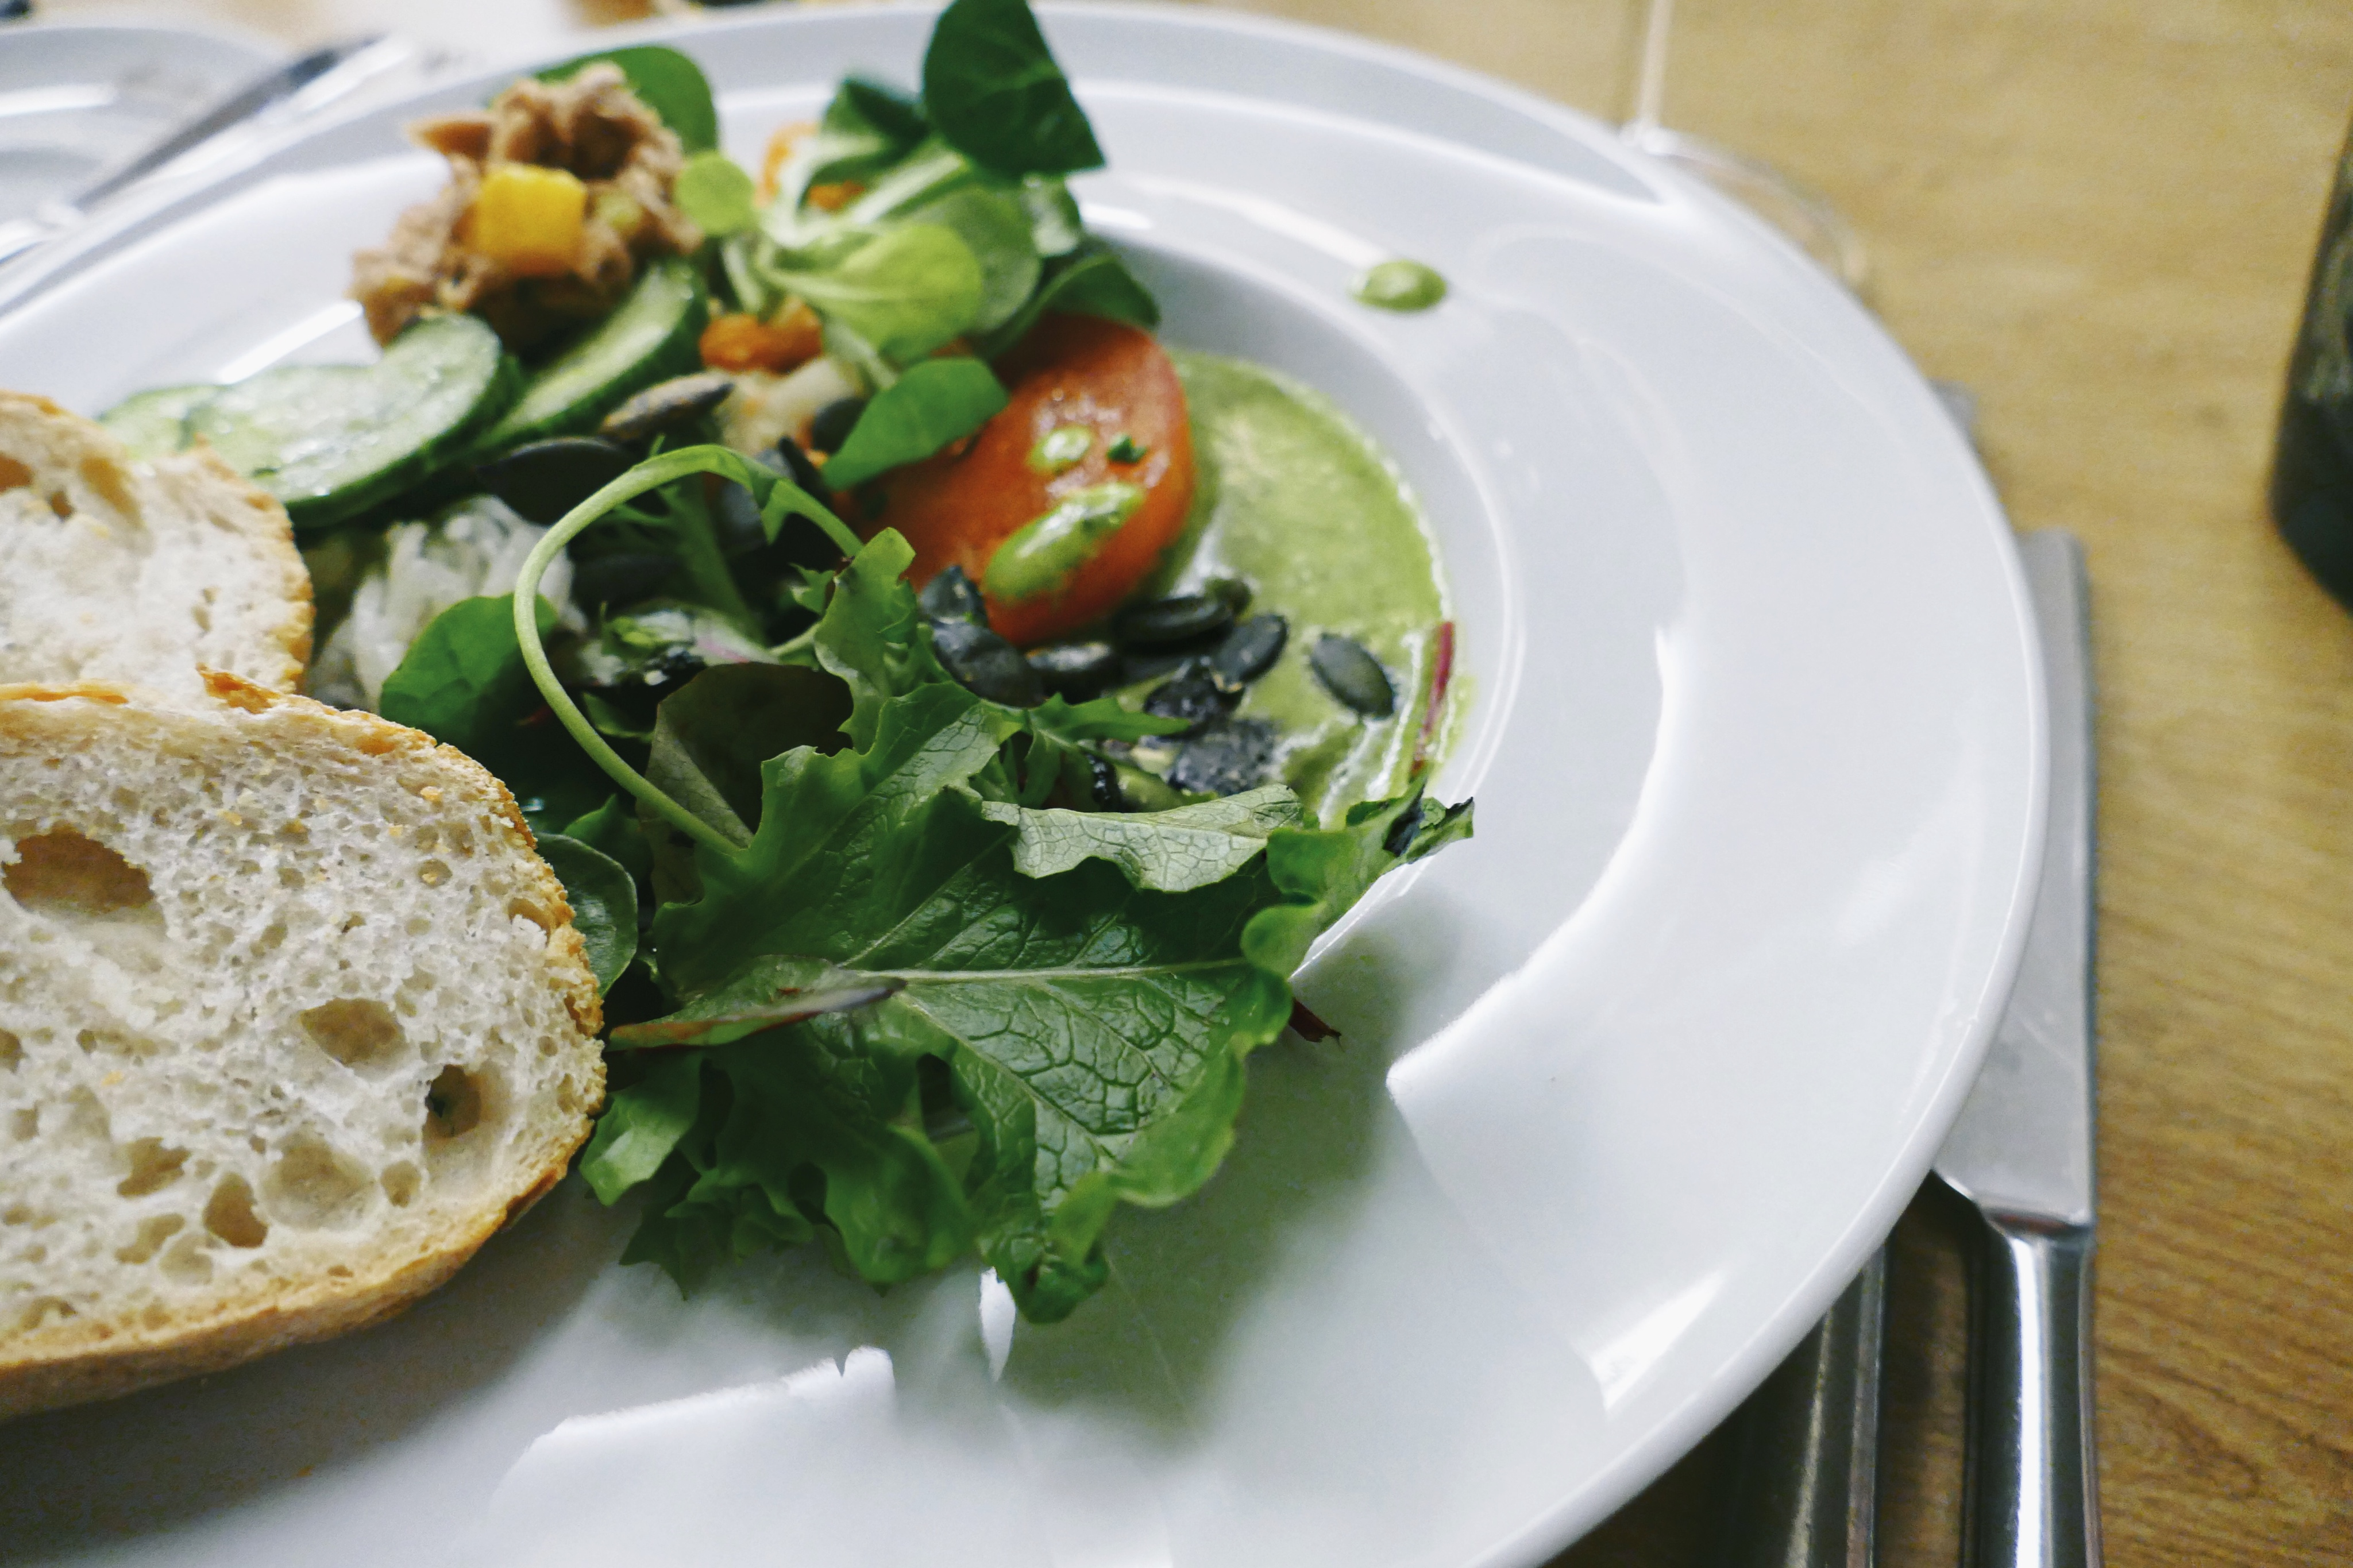 Kochen, Nudeln, Hotel Service, Kulinarik, Salat Salatbuffet